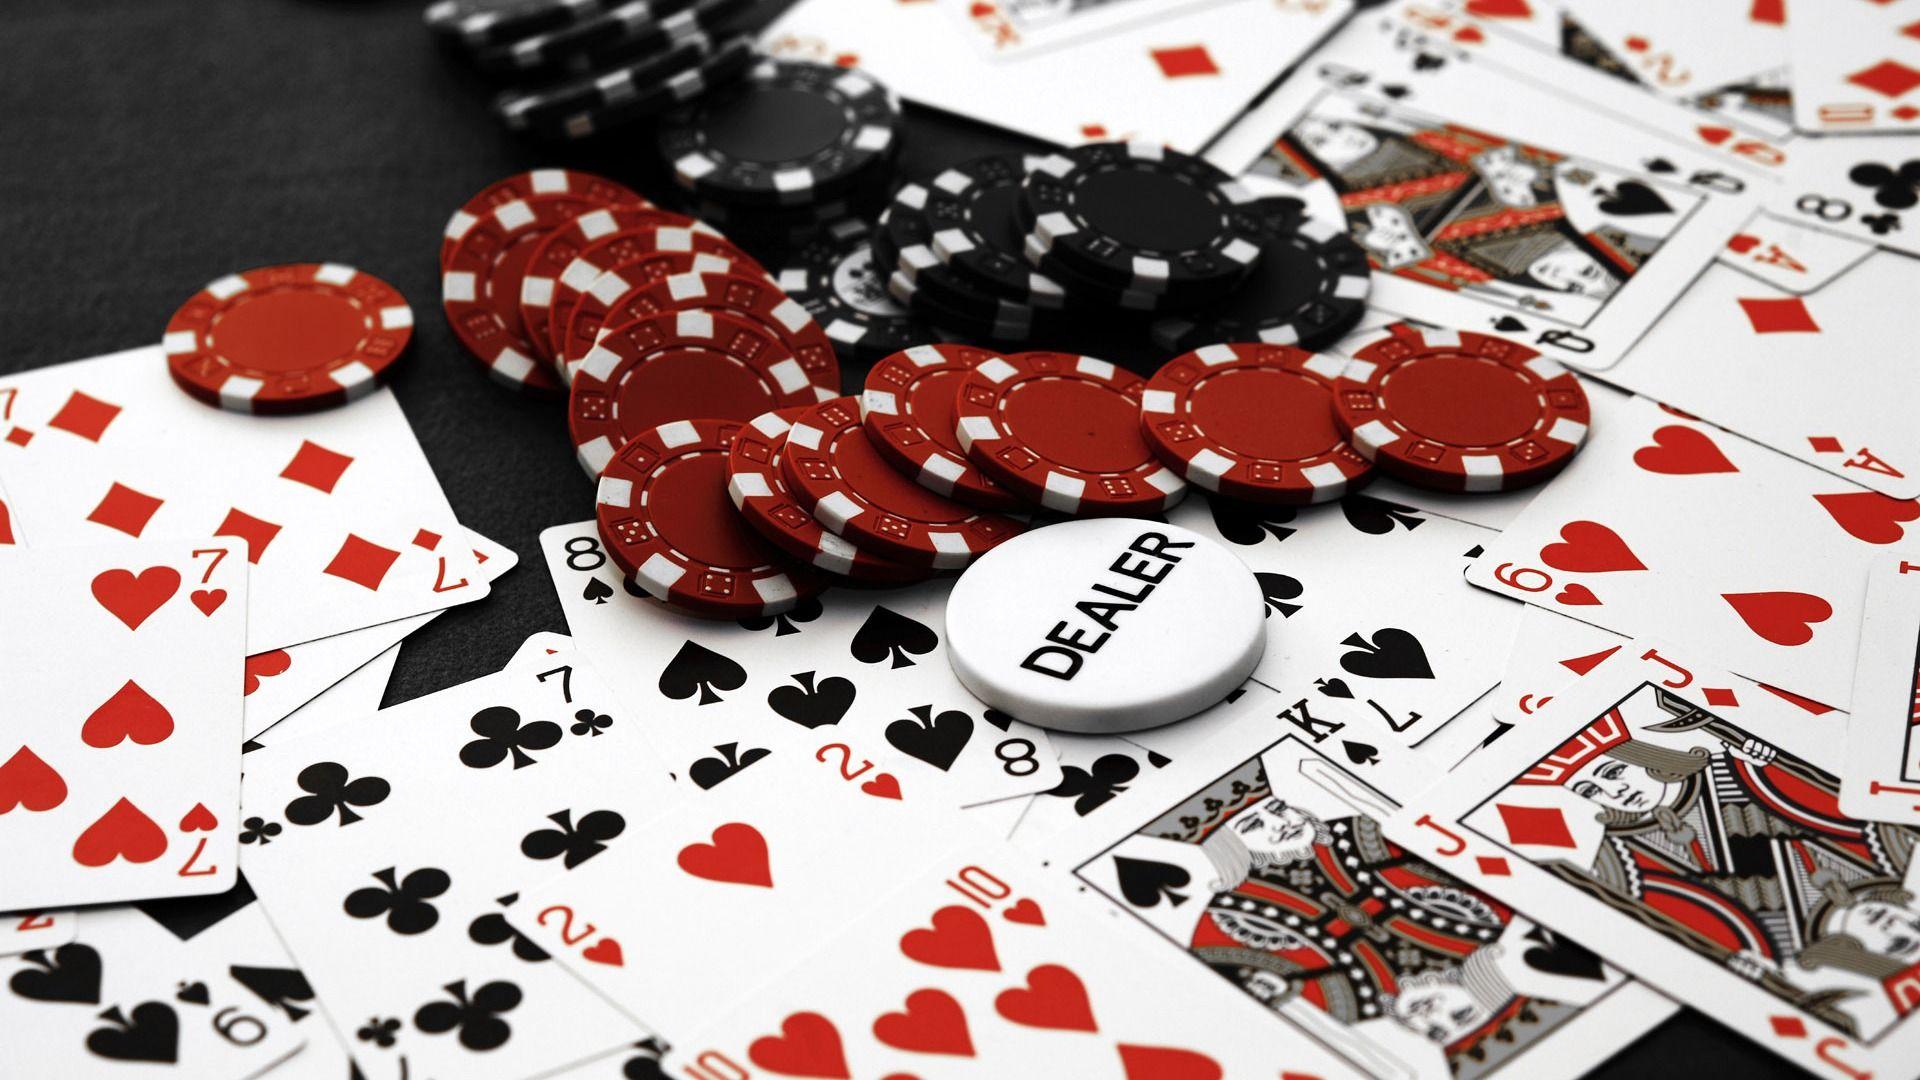 Casinos & Gambling